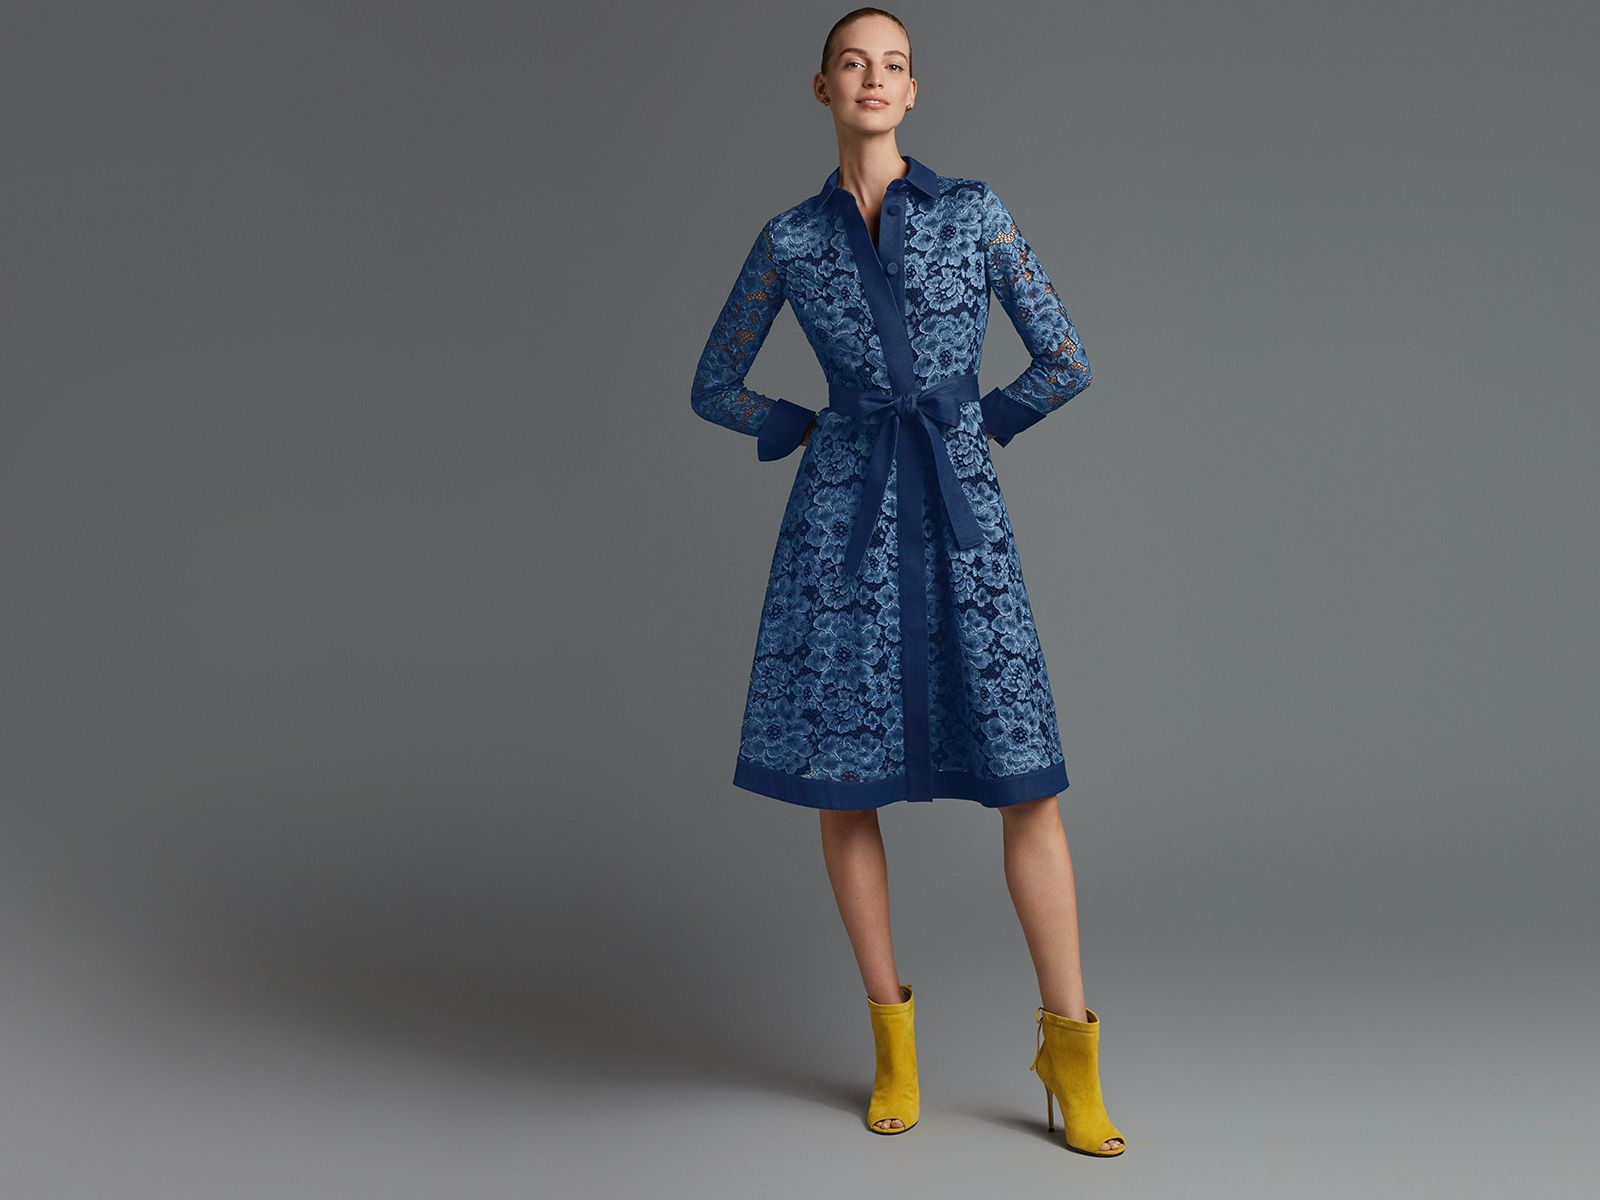 Lace and denim shirt dress